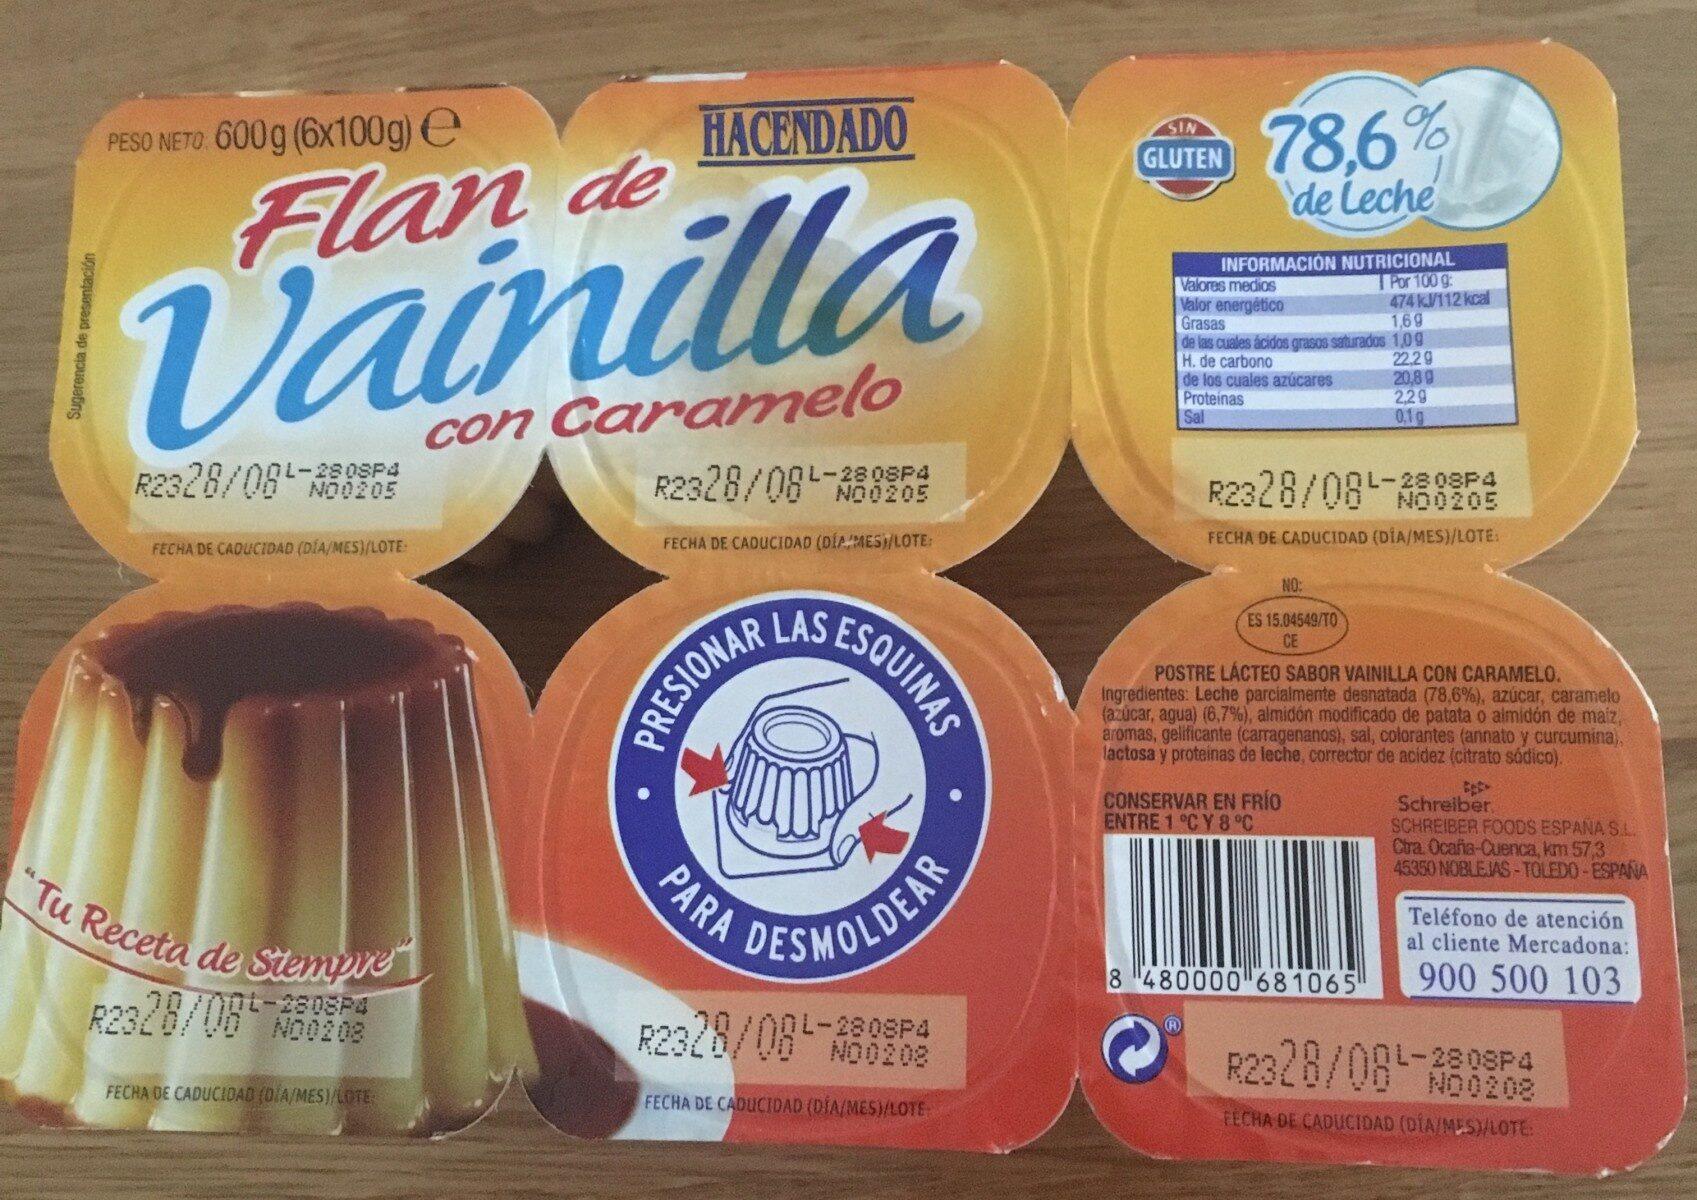 Flan de vanilla - Producte - es